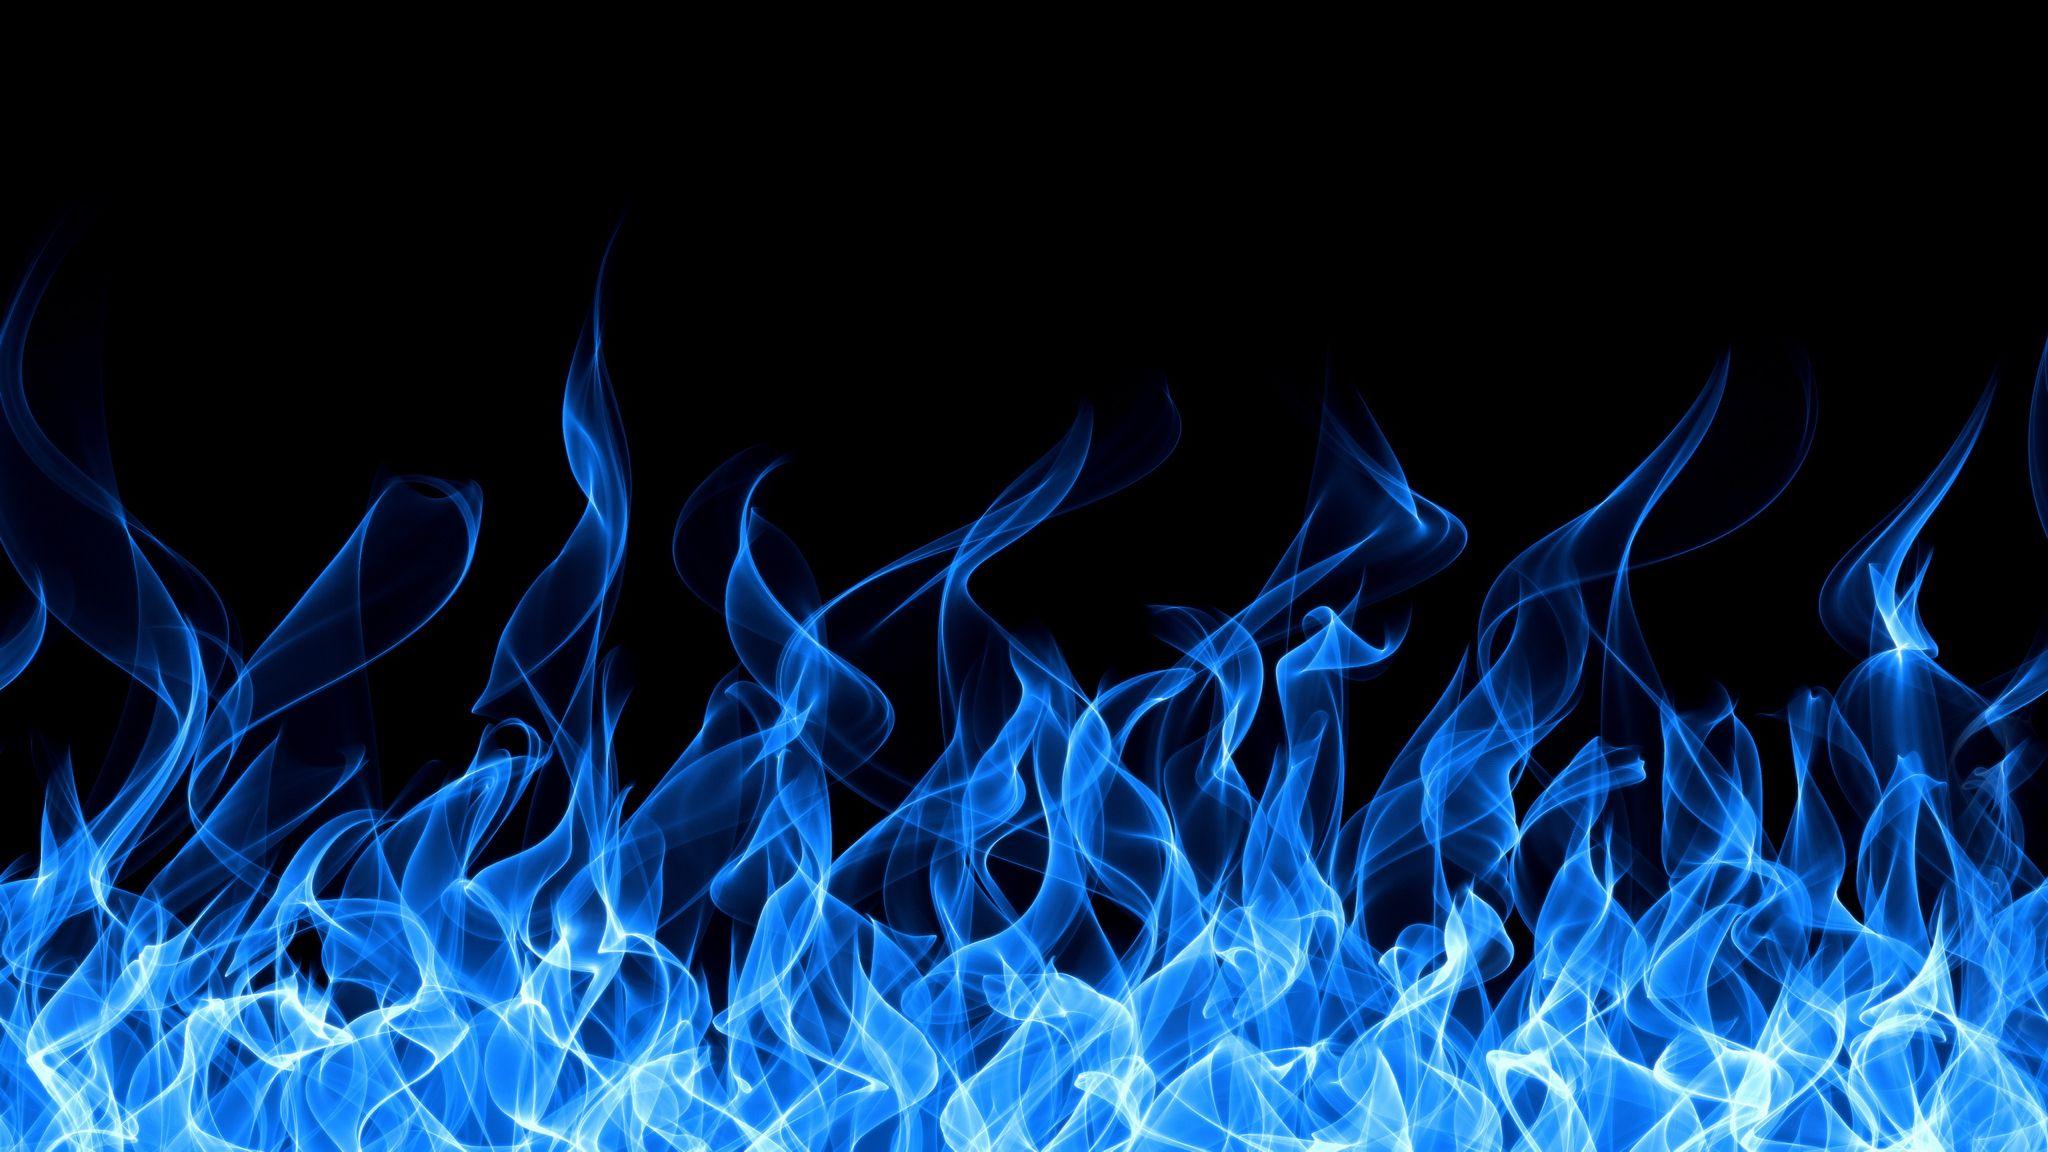 Blue Flames Graphic Design Blue Flames Black Background Images Eyes Wallpaper